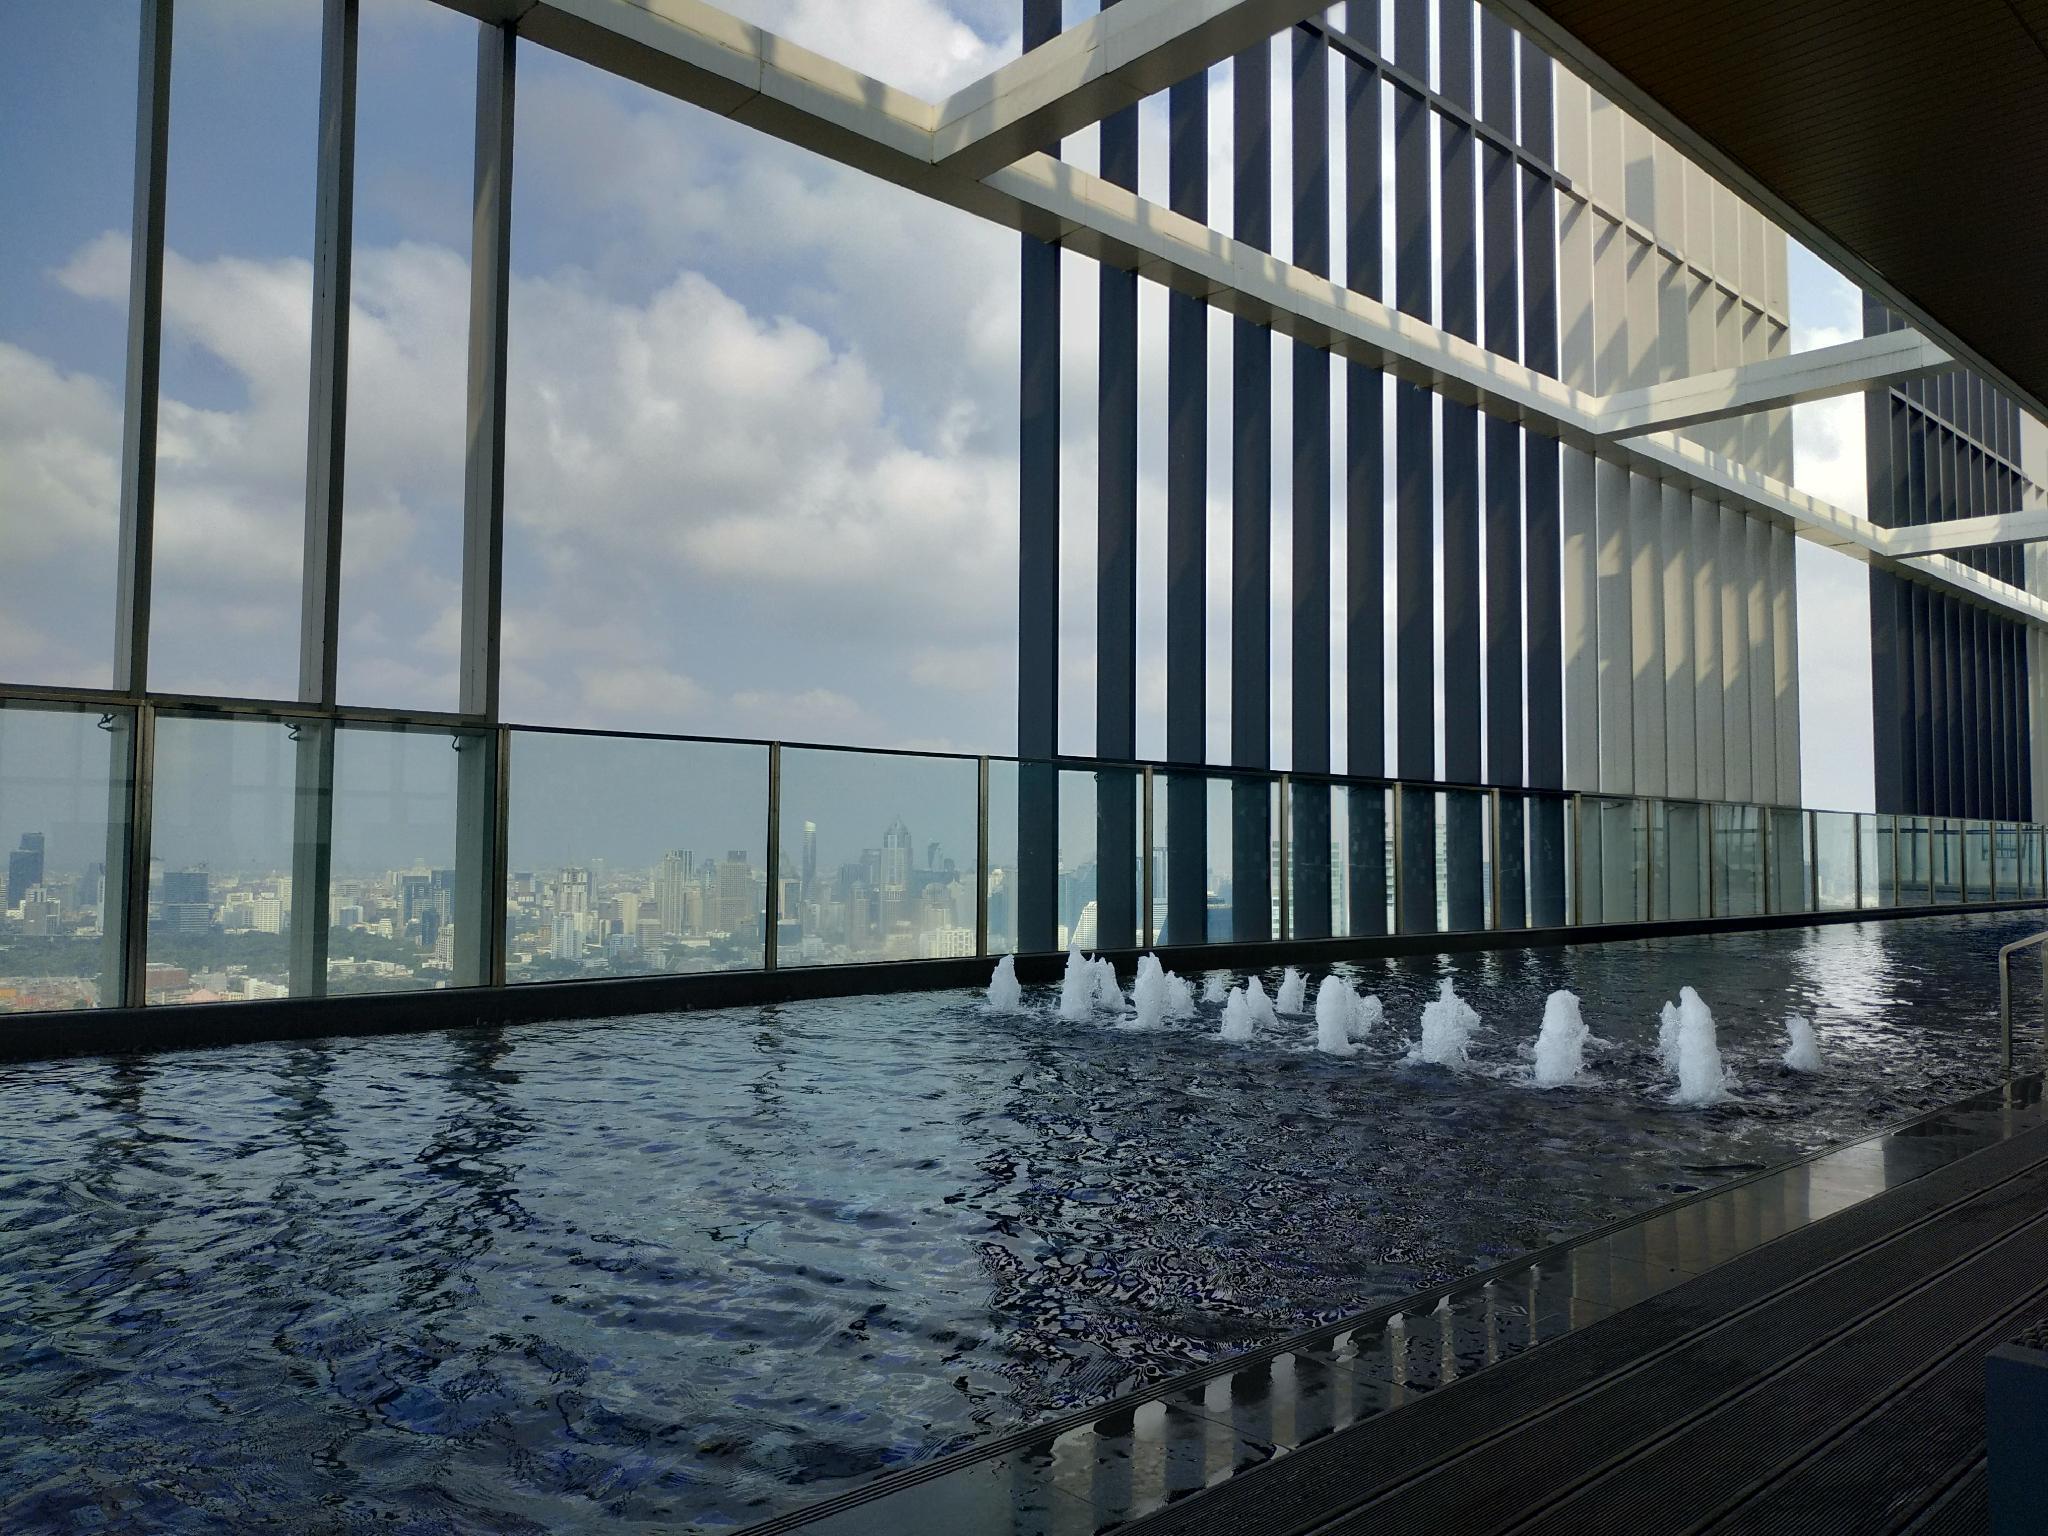 Rooftop pool gym luxury cozy condo free wifi  44 อพาร์ตเมนต์ 1 ห้องนอน 1 ห้องน้ำส่วนตัว ขนาด 30 ตร.ม. – สุขุมวิท